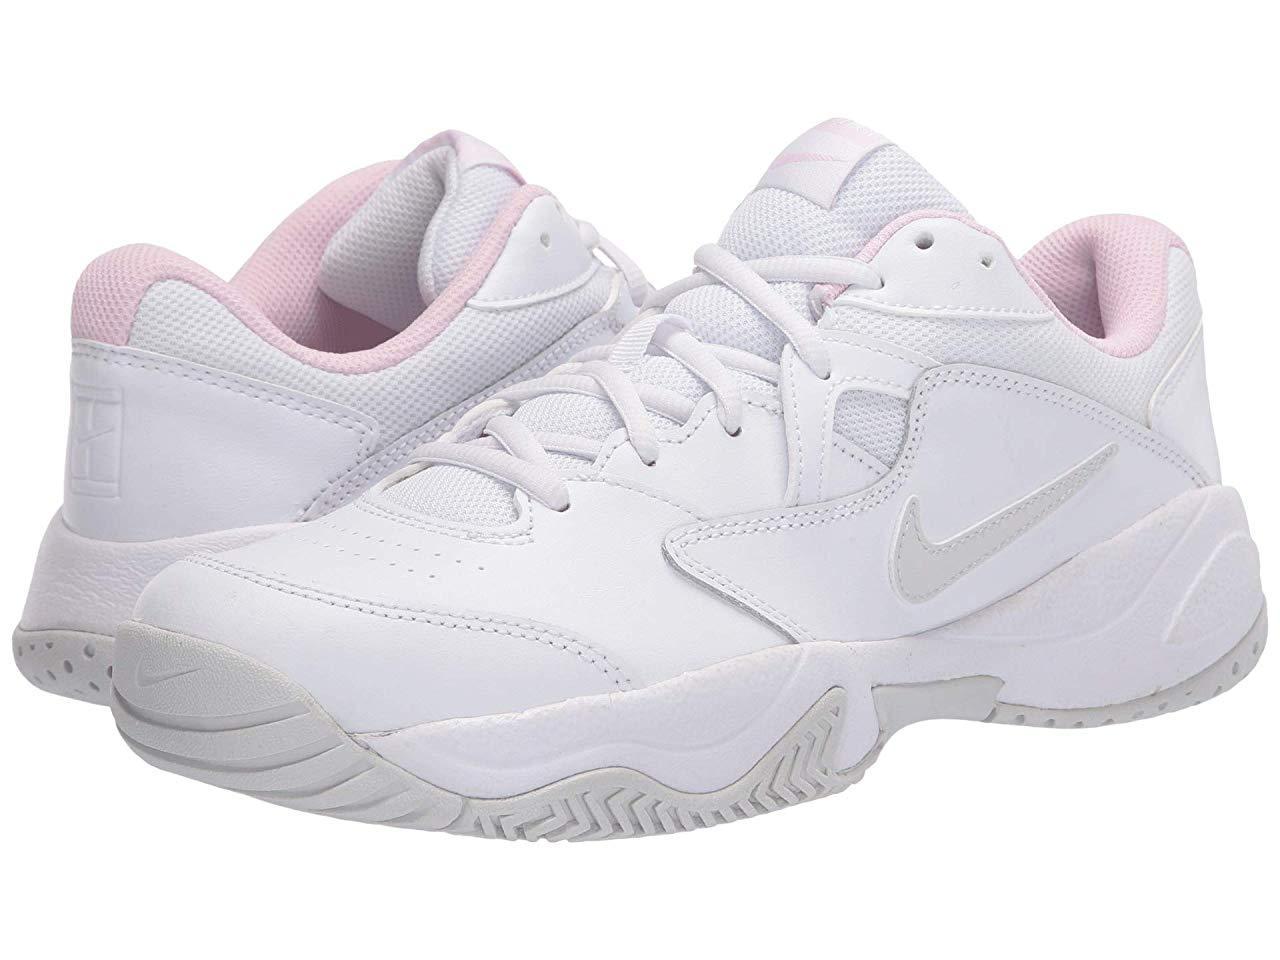 Кроссовки/Кеды Nike Court Lite 2 White/Photon Dust/Echo Pink